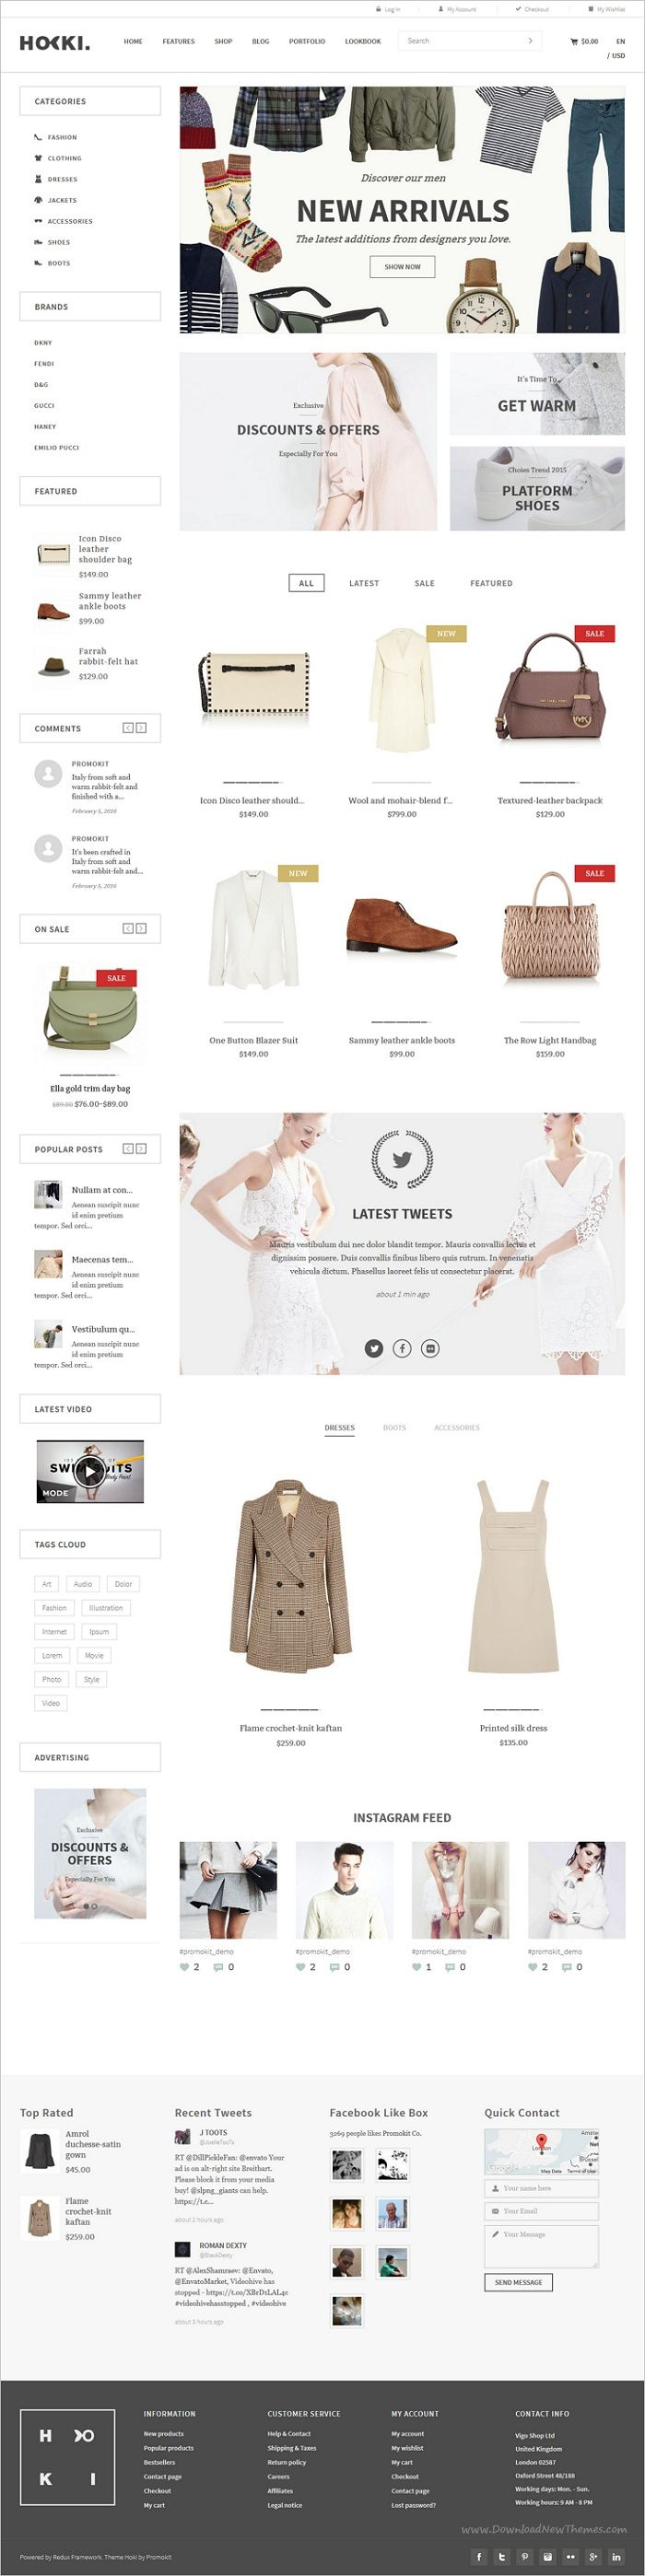 Hoki is a wonderful responsive #WooCommerce #WordPress theme for stunning #eCommerce websites with multiple homepage layouts download now➩ https://themeforest.net/item/hoki-multipurpose-responsive-wordpress-woocommerce-theme/18950303?ref=Datasata